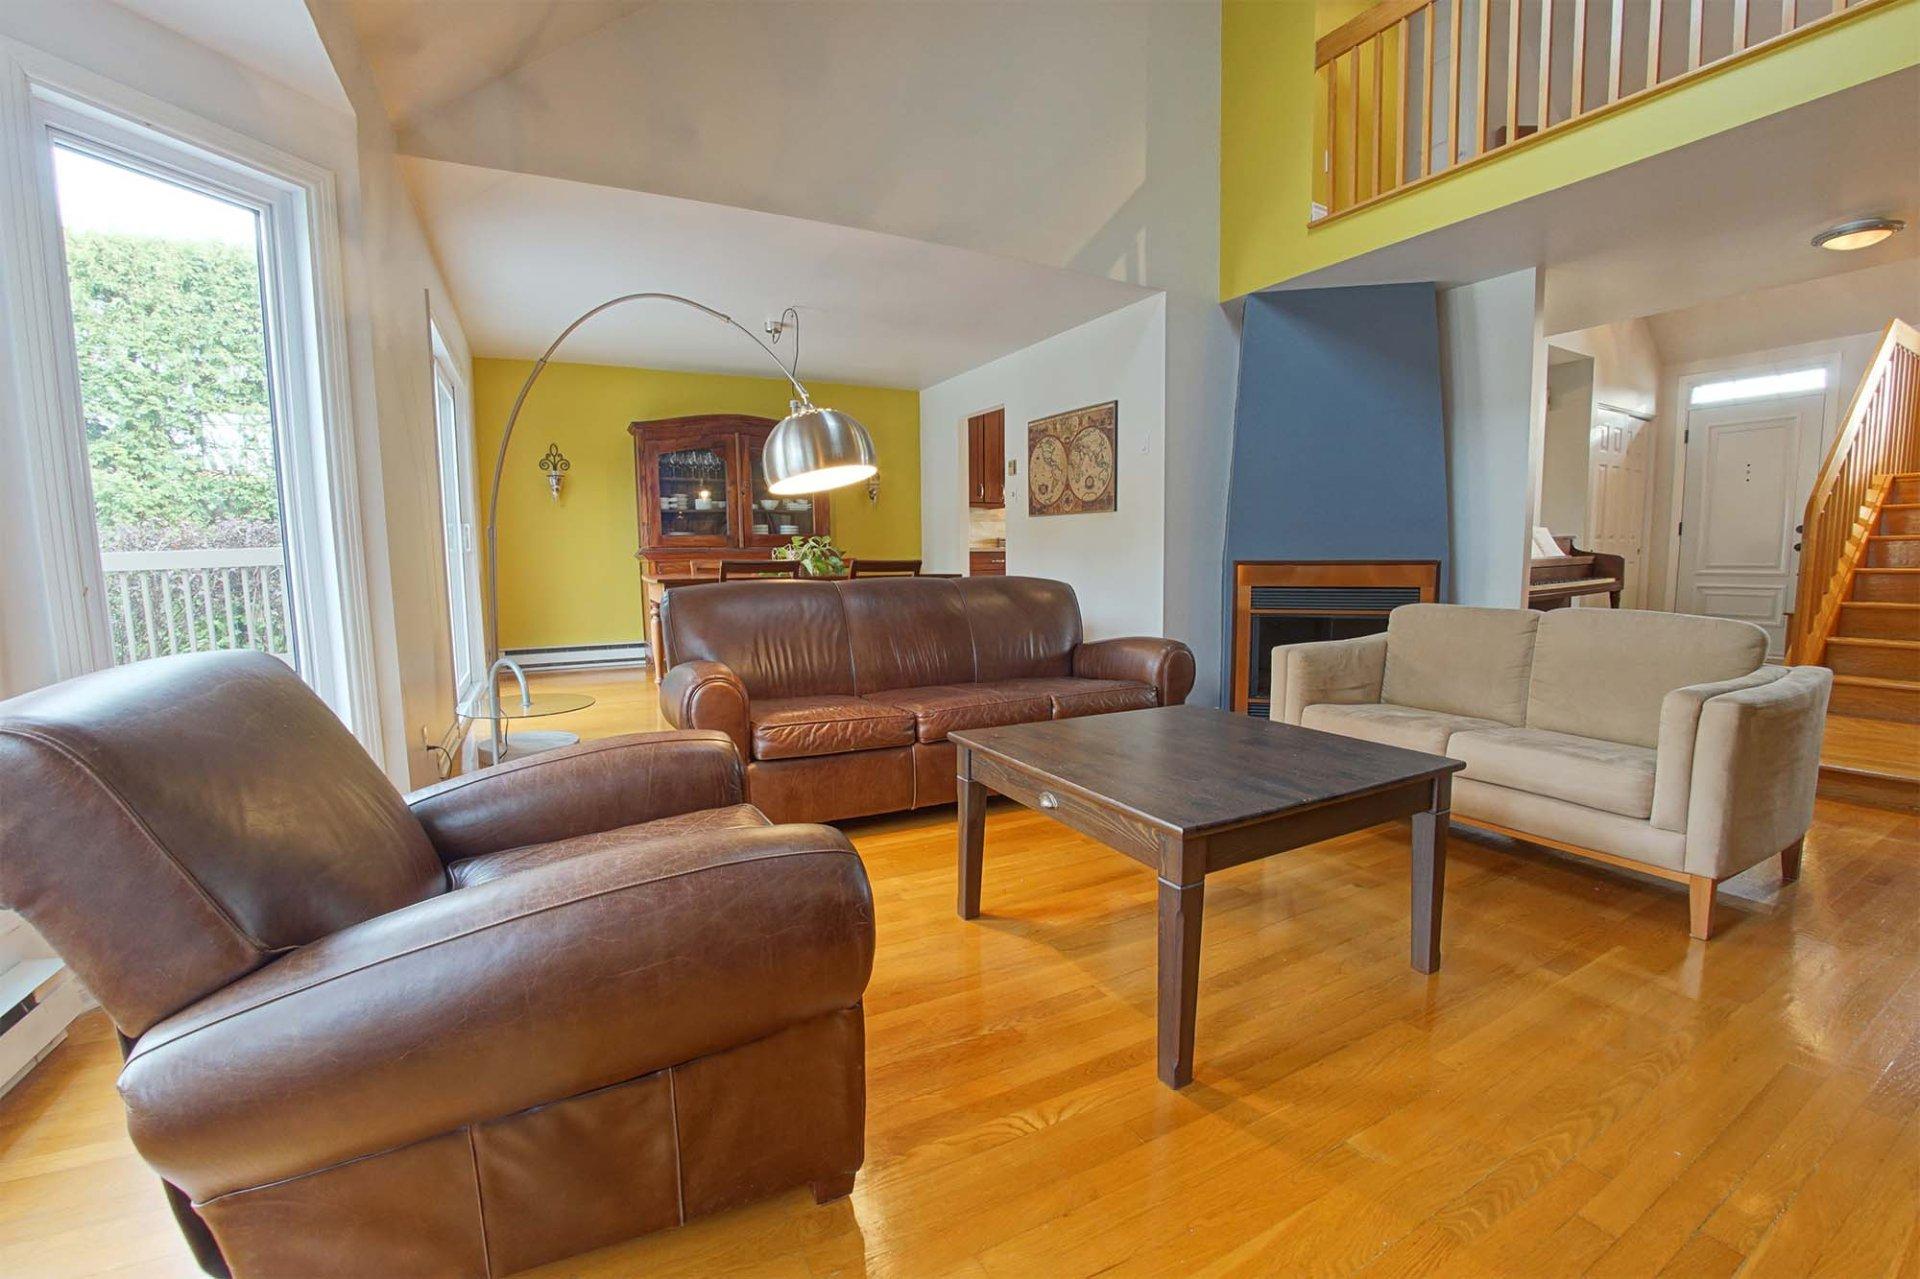 electricien sainte genevieve des bois gallery of. Black Bedroom Furniture Sets. Home Design Ideas